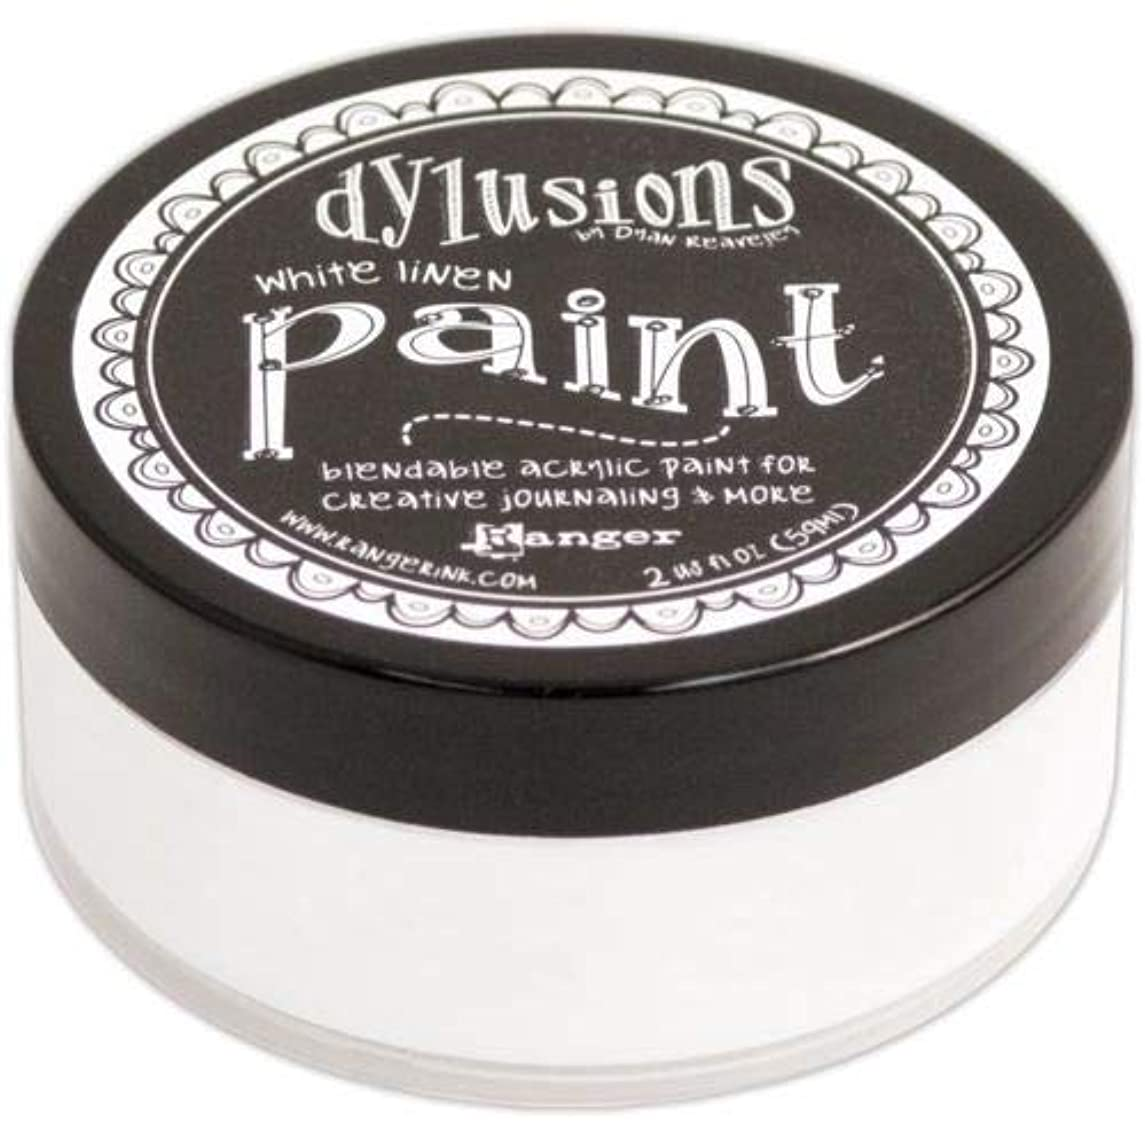 Ranger Dyan Reaveley's Dylusions Paint, 2 oz, White Linen